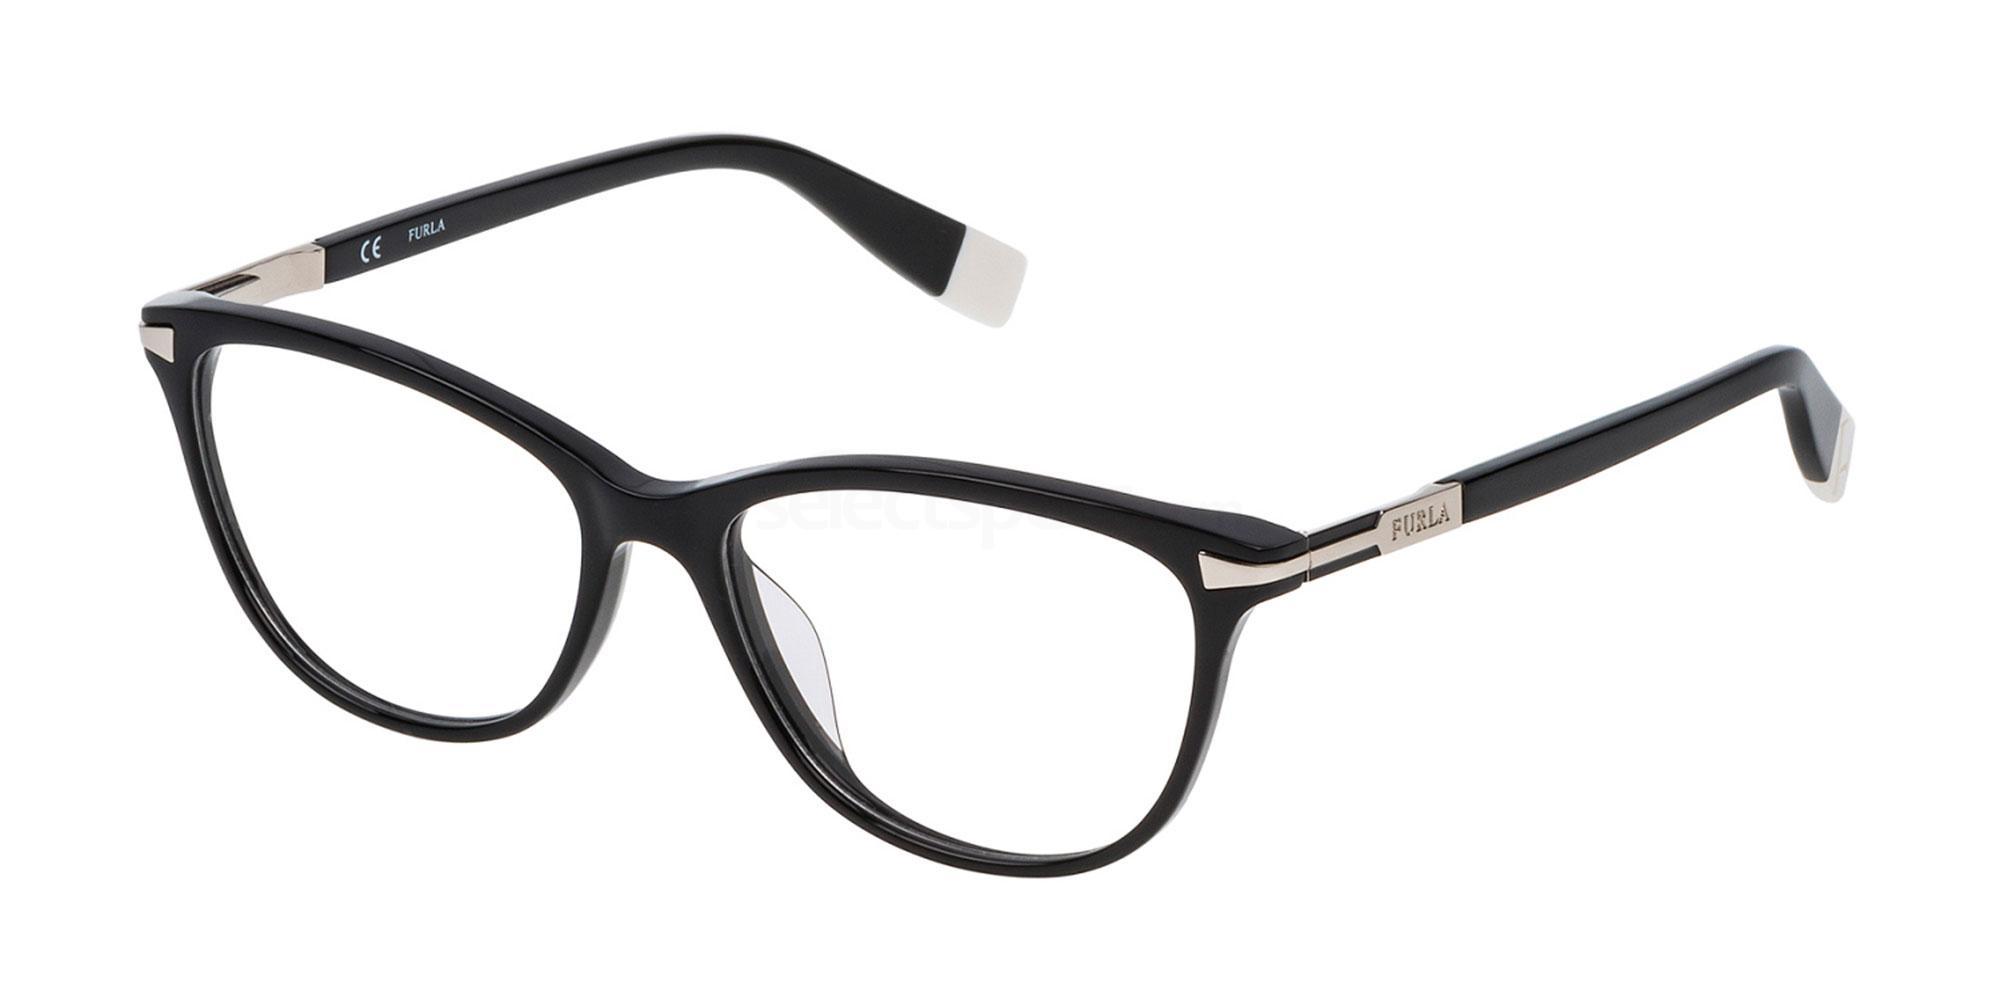 0700 VFU025 Glasses, Furla